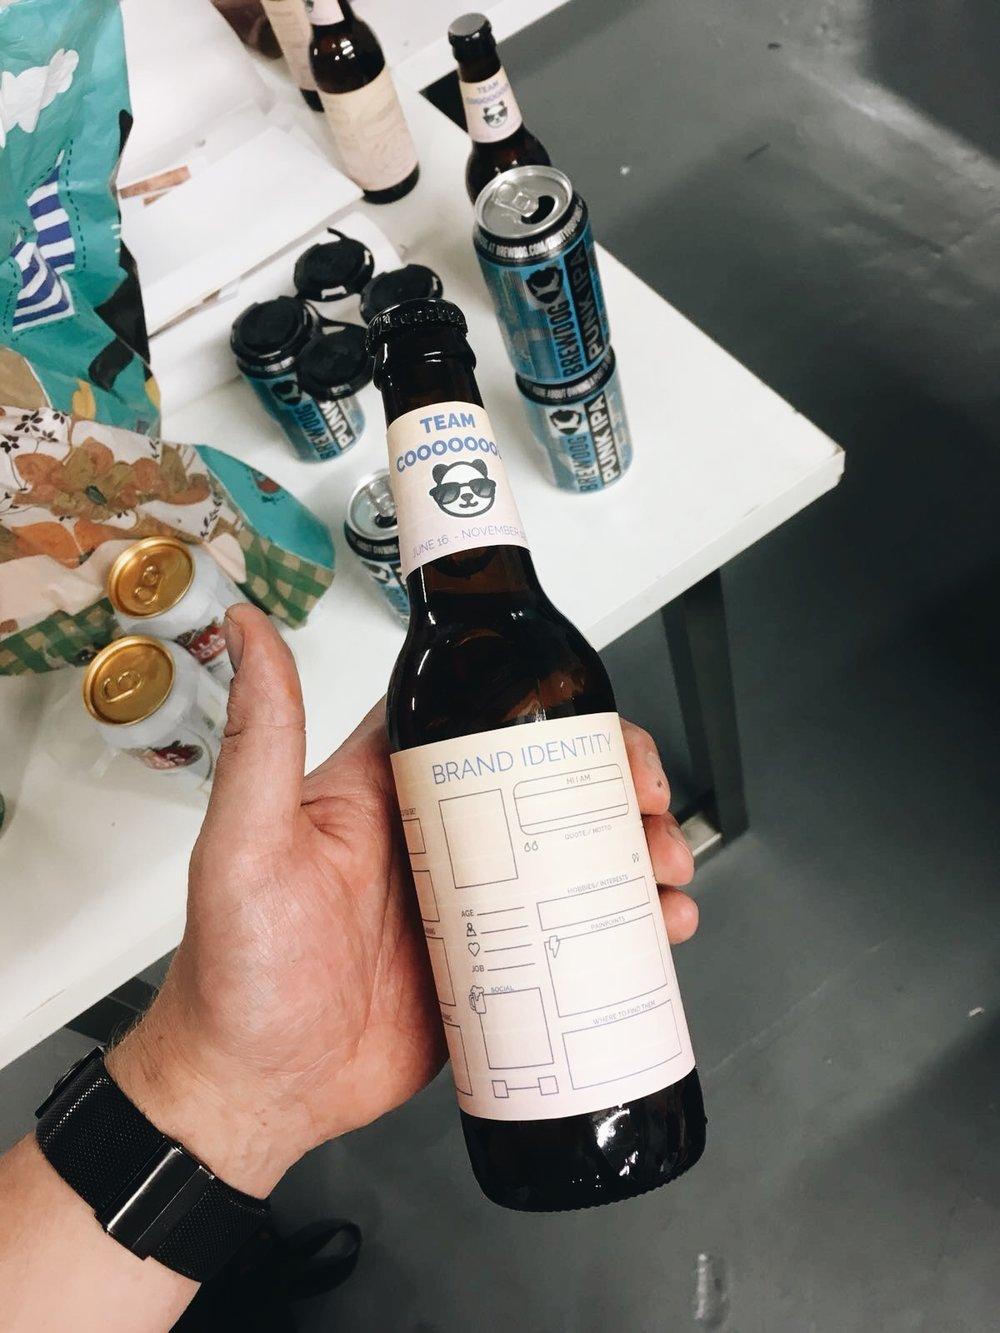 Label Prototype of ShinDigger's workshop beer for businesses